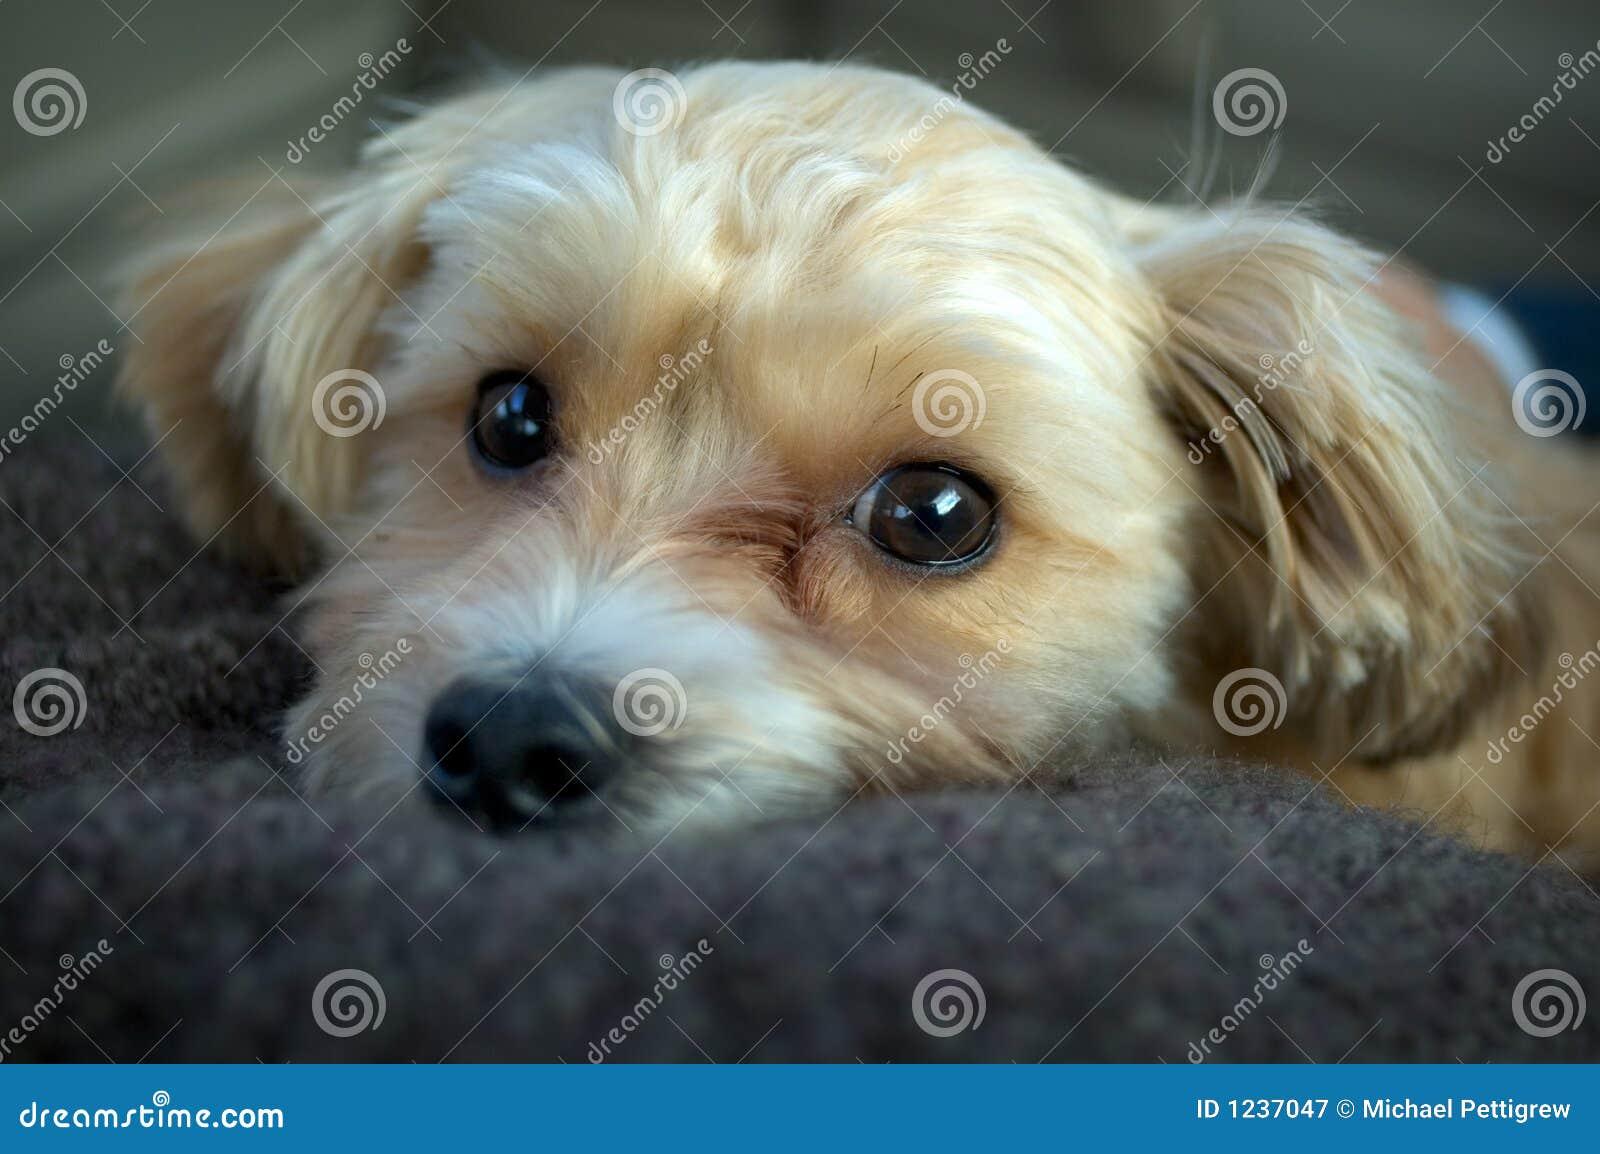 Yorkie Shih Tzu Puppies